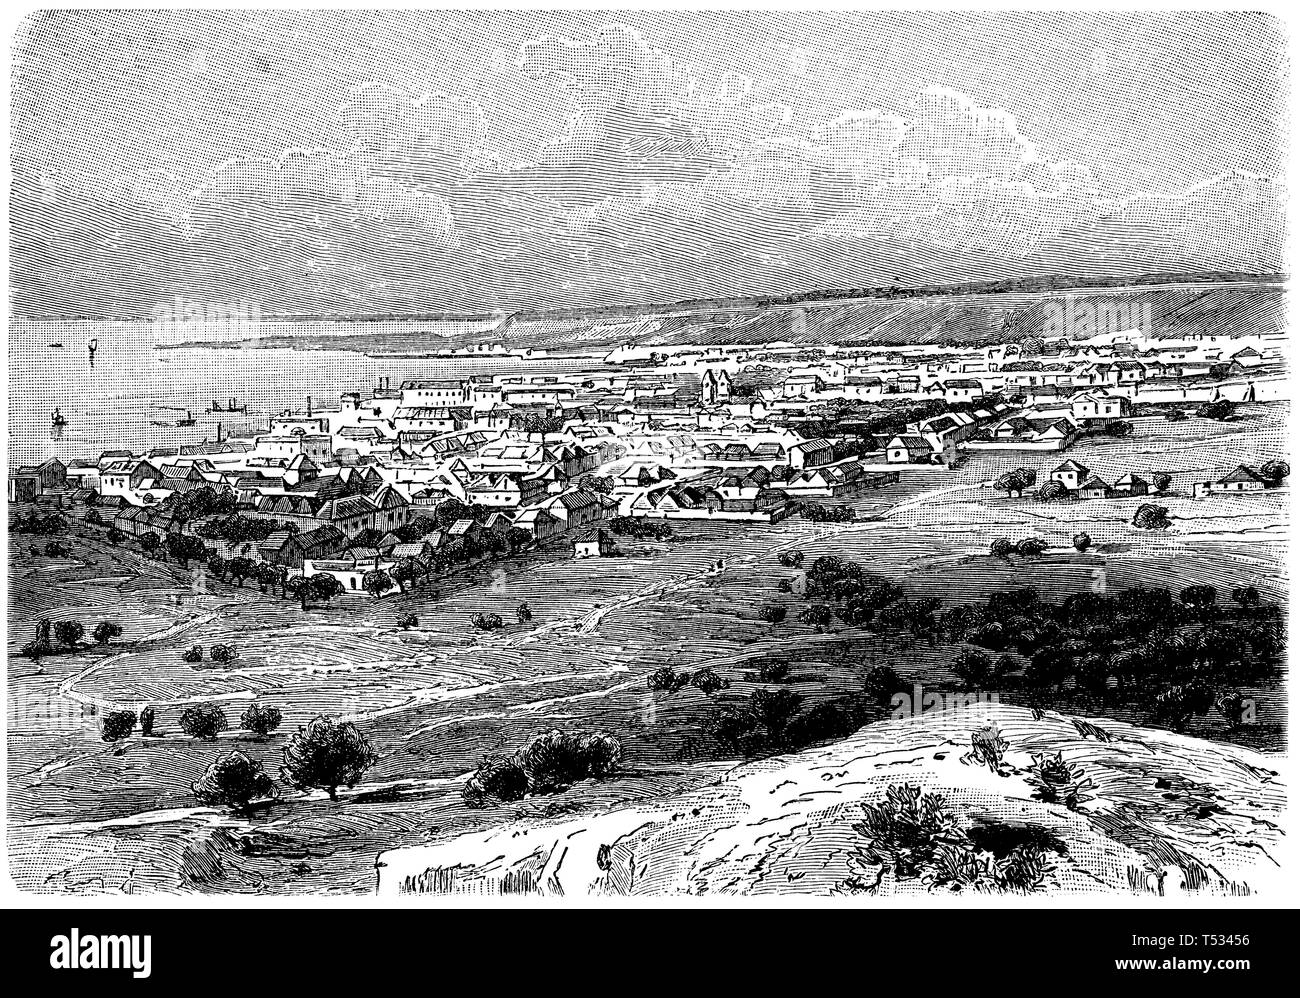 Sao Paulo de Loanda, anonym  1897 - Stock Image